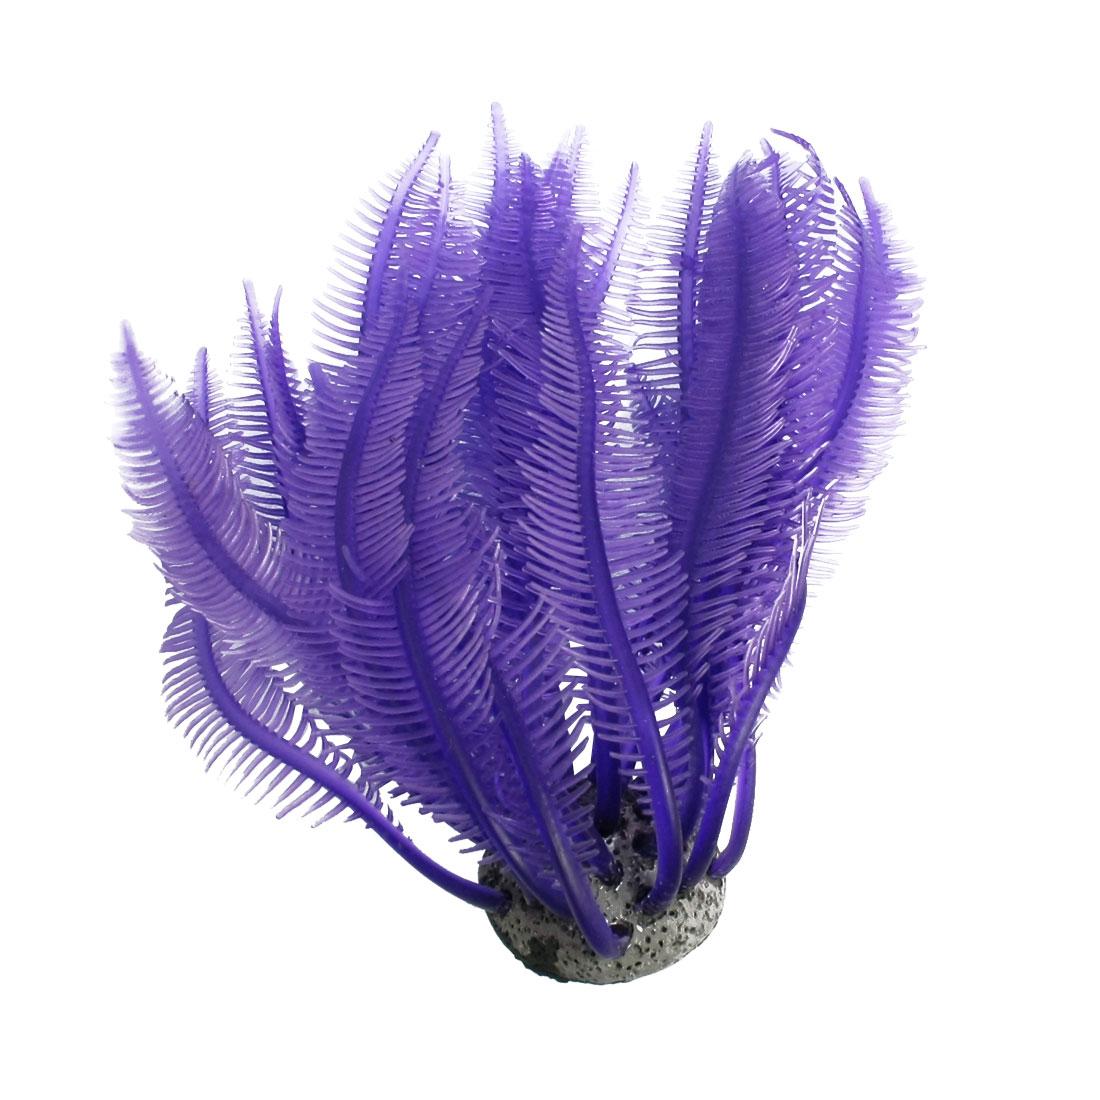 Aquarium Purple Soft Silicone Coral Shaped Ornament with Concrete Base